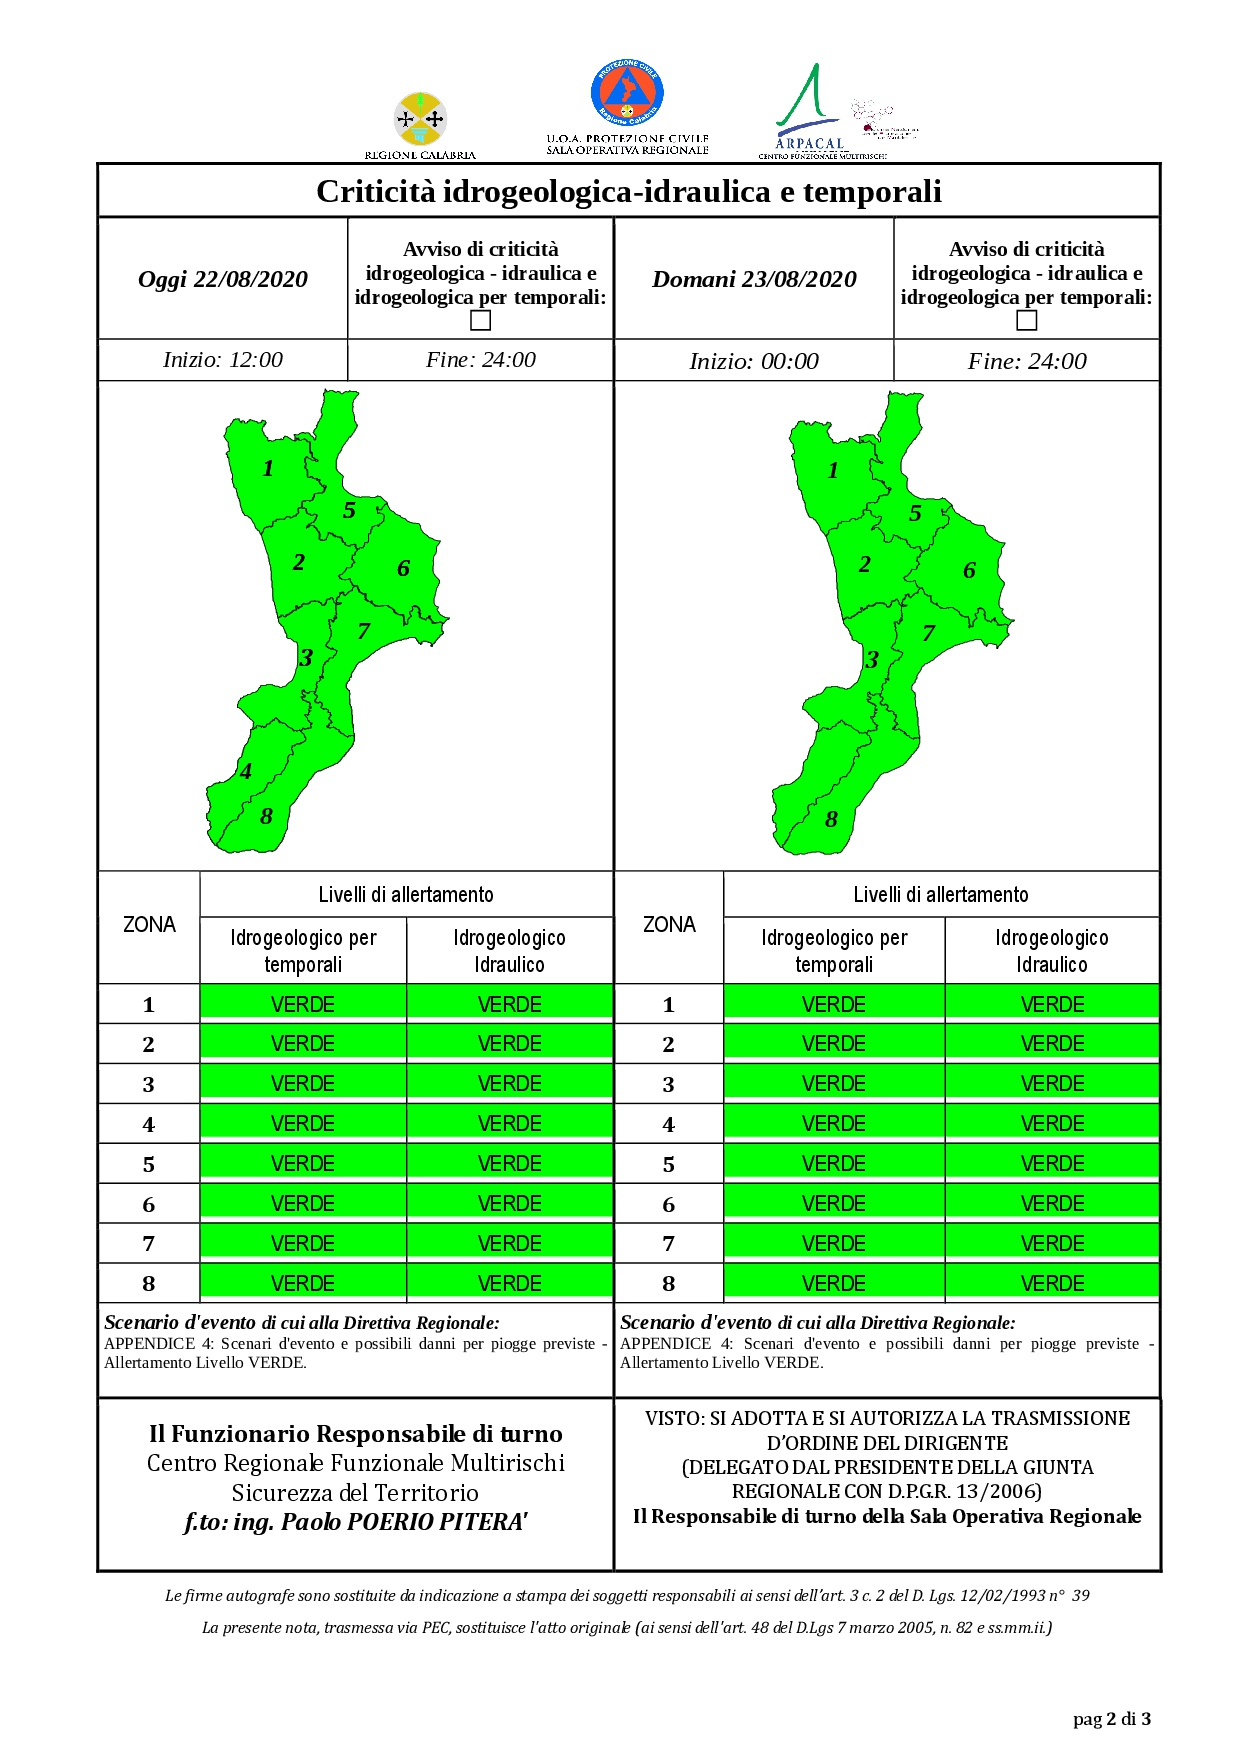 Criticità idrogeologica-idraulica e temporali in Calabria 22-08-2020